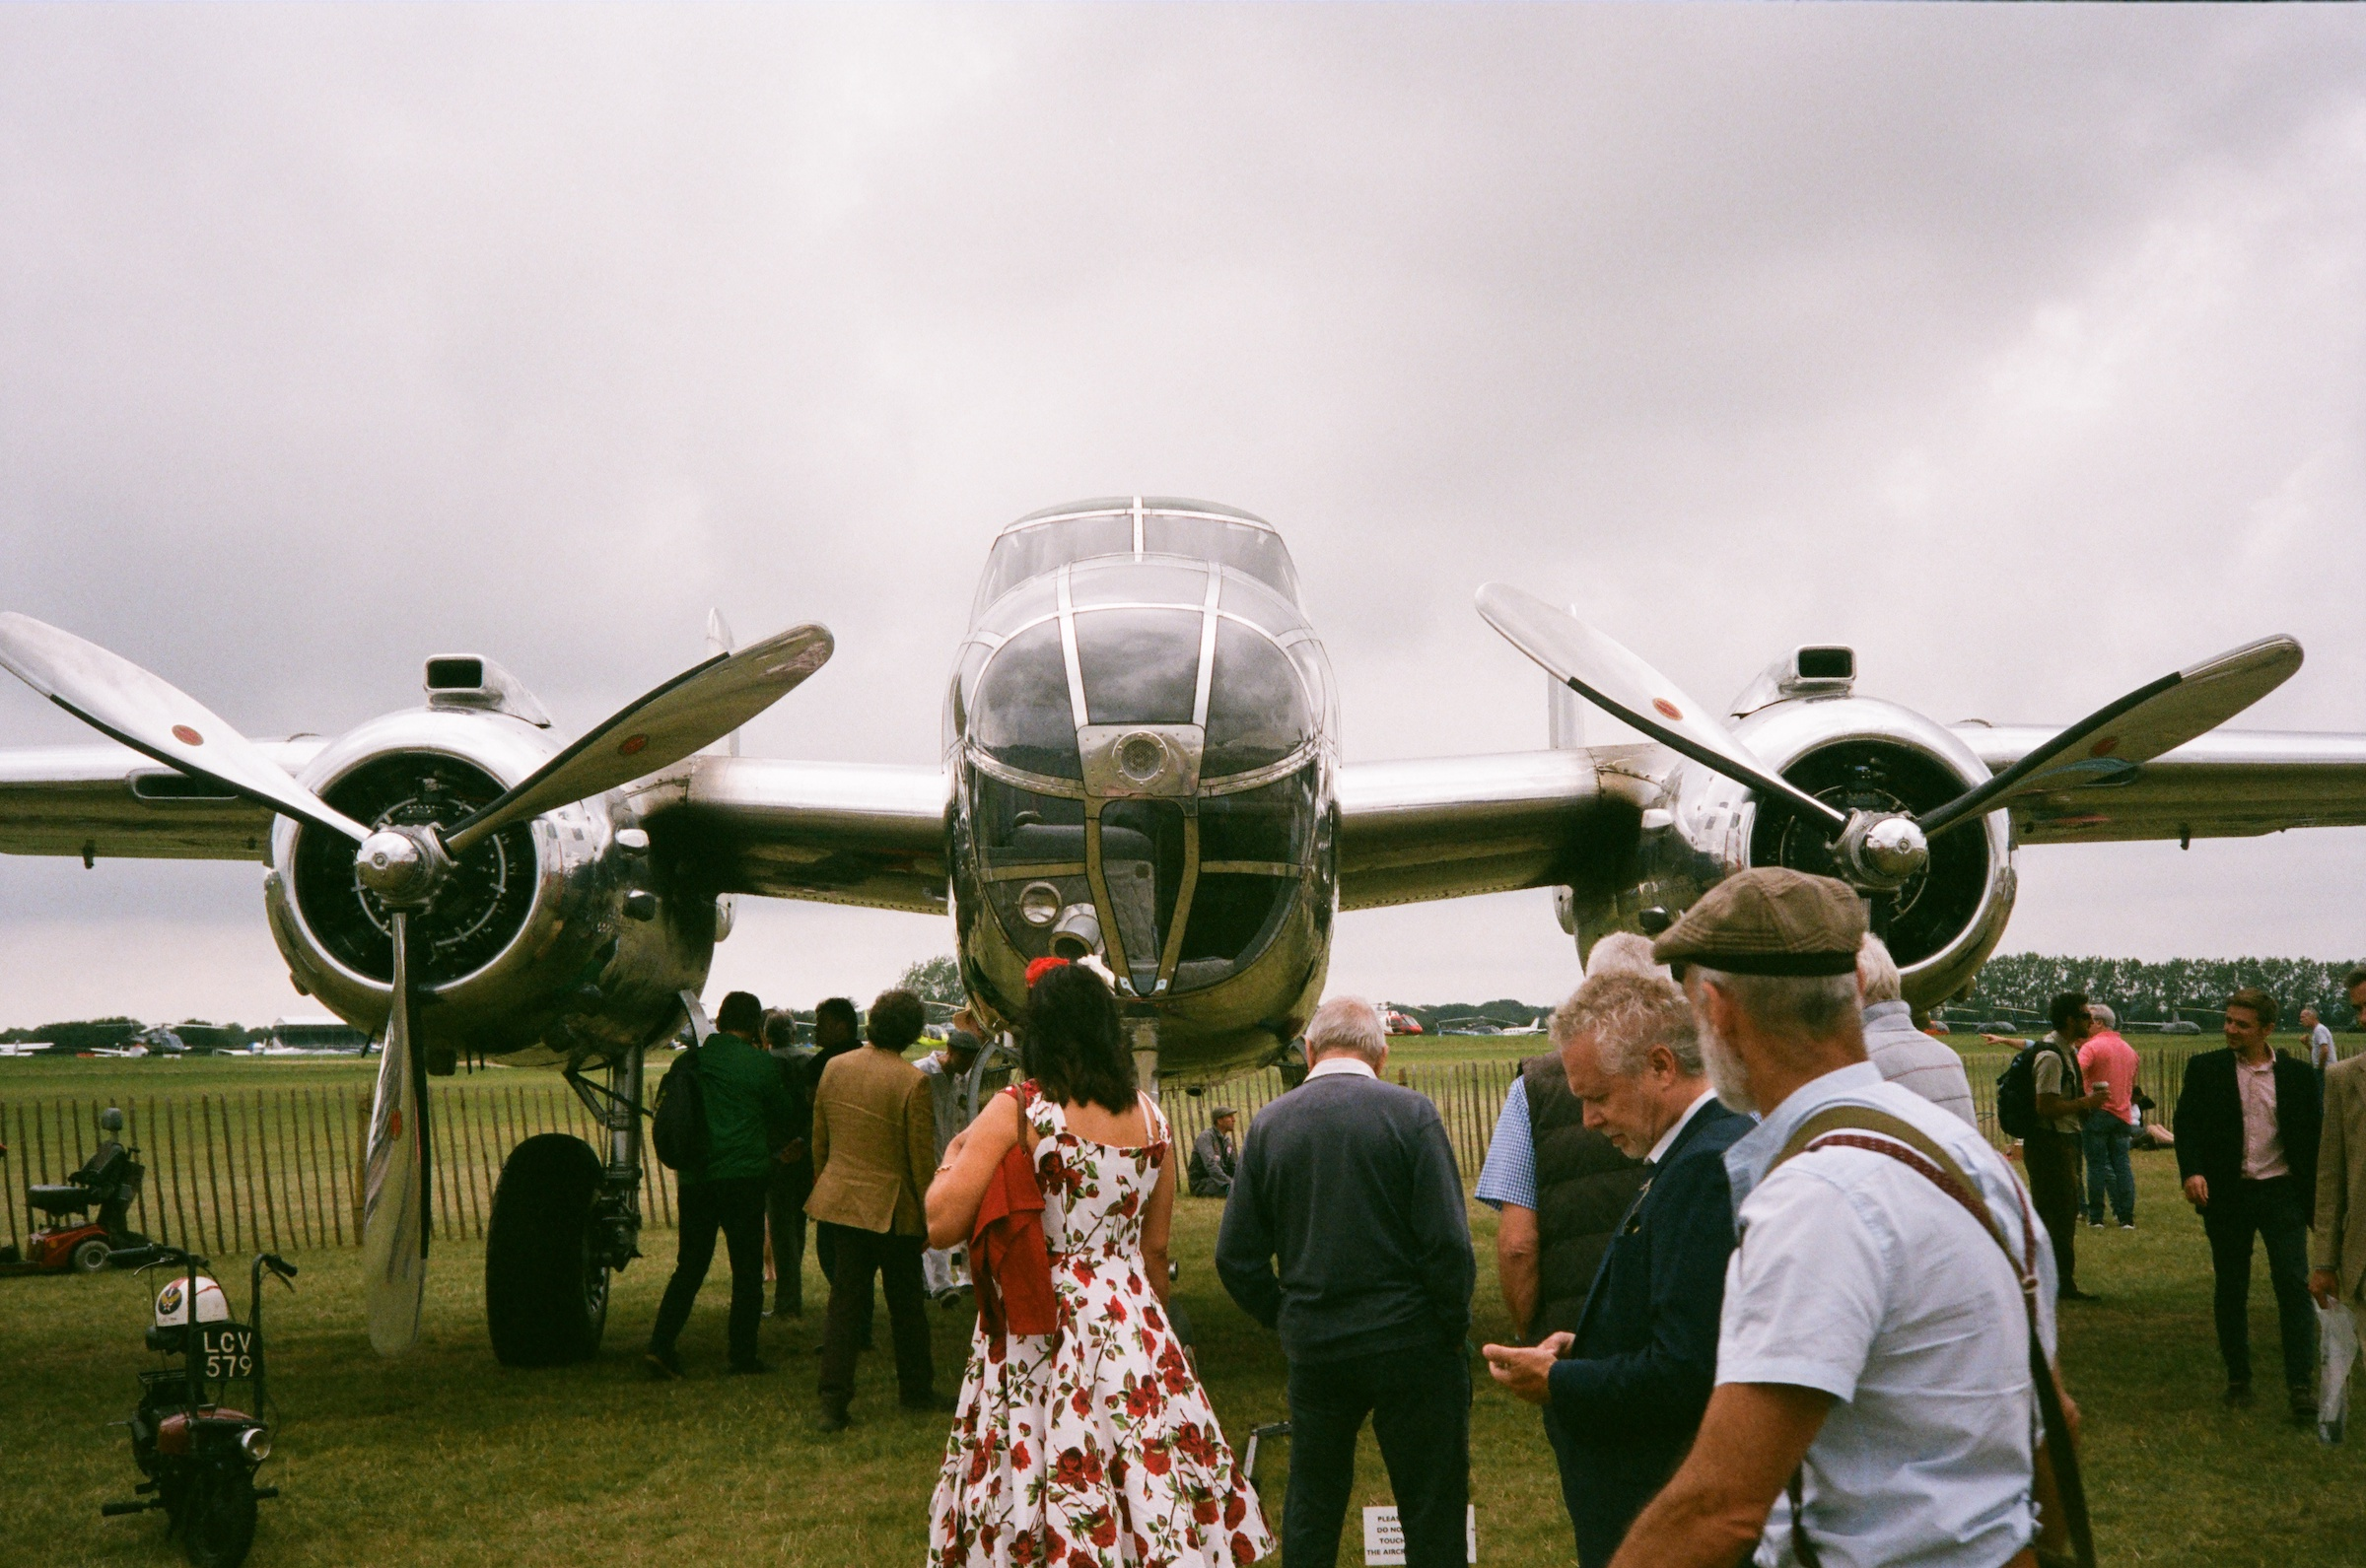 Goodwood Revival film world war 2 airplane